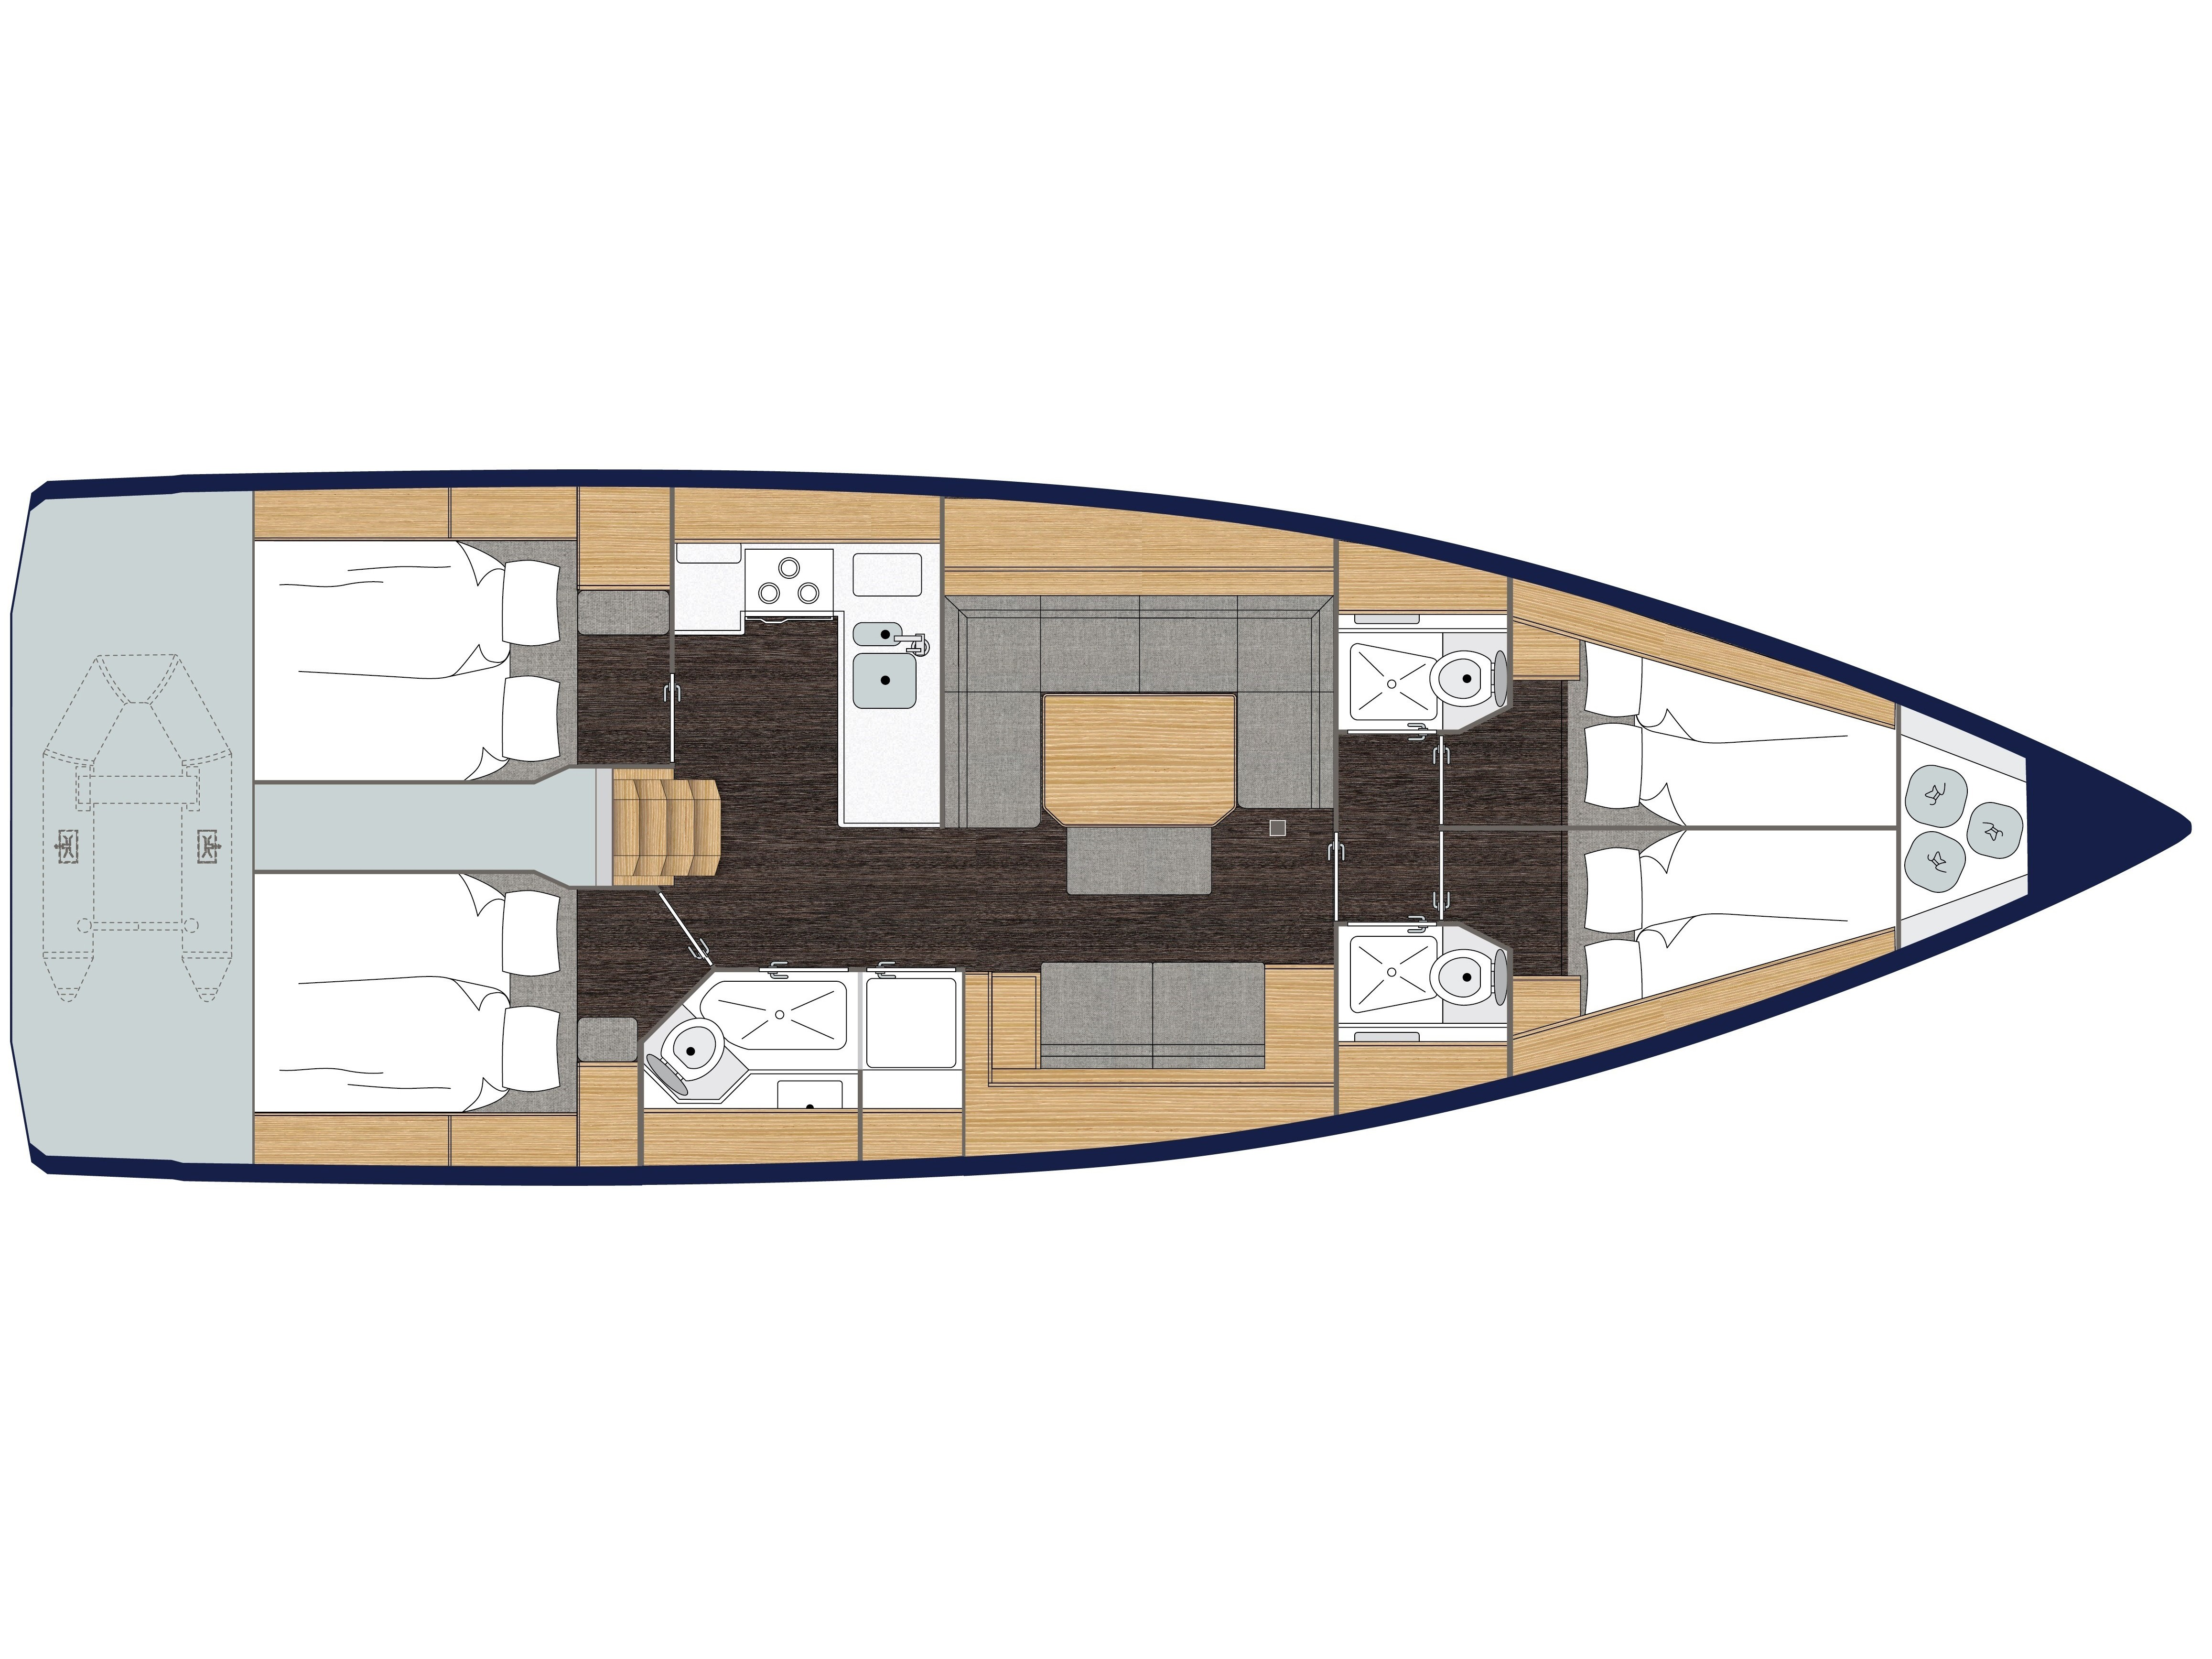 S/Y - Bavaria C45 - 4 Cabins - Built 2020